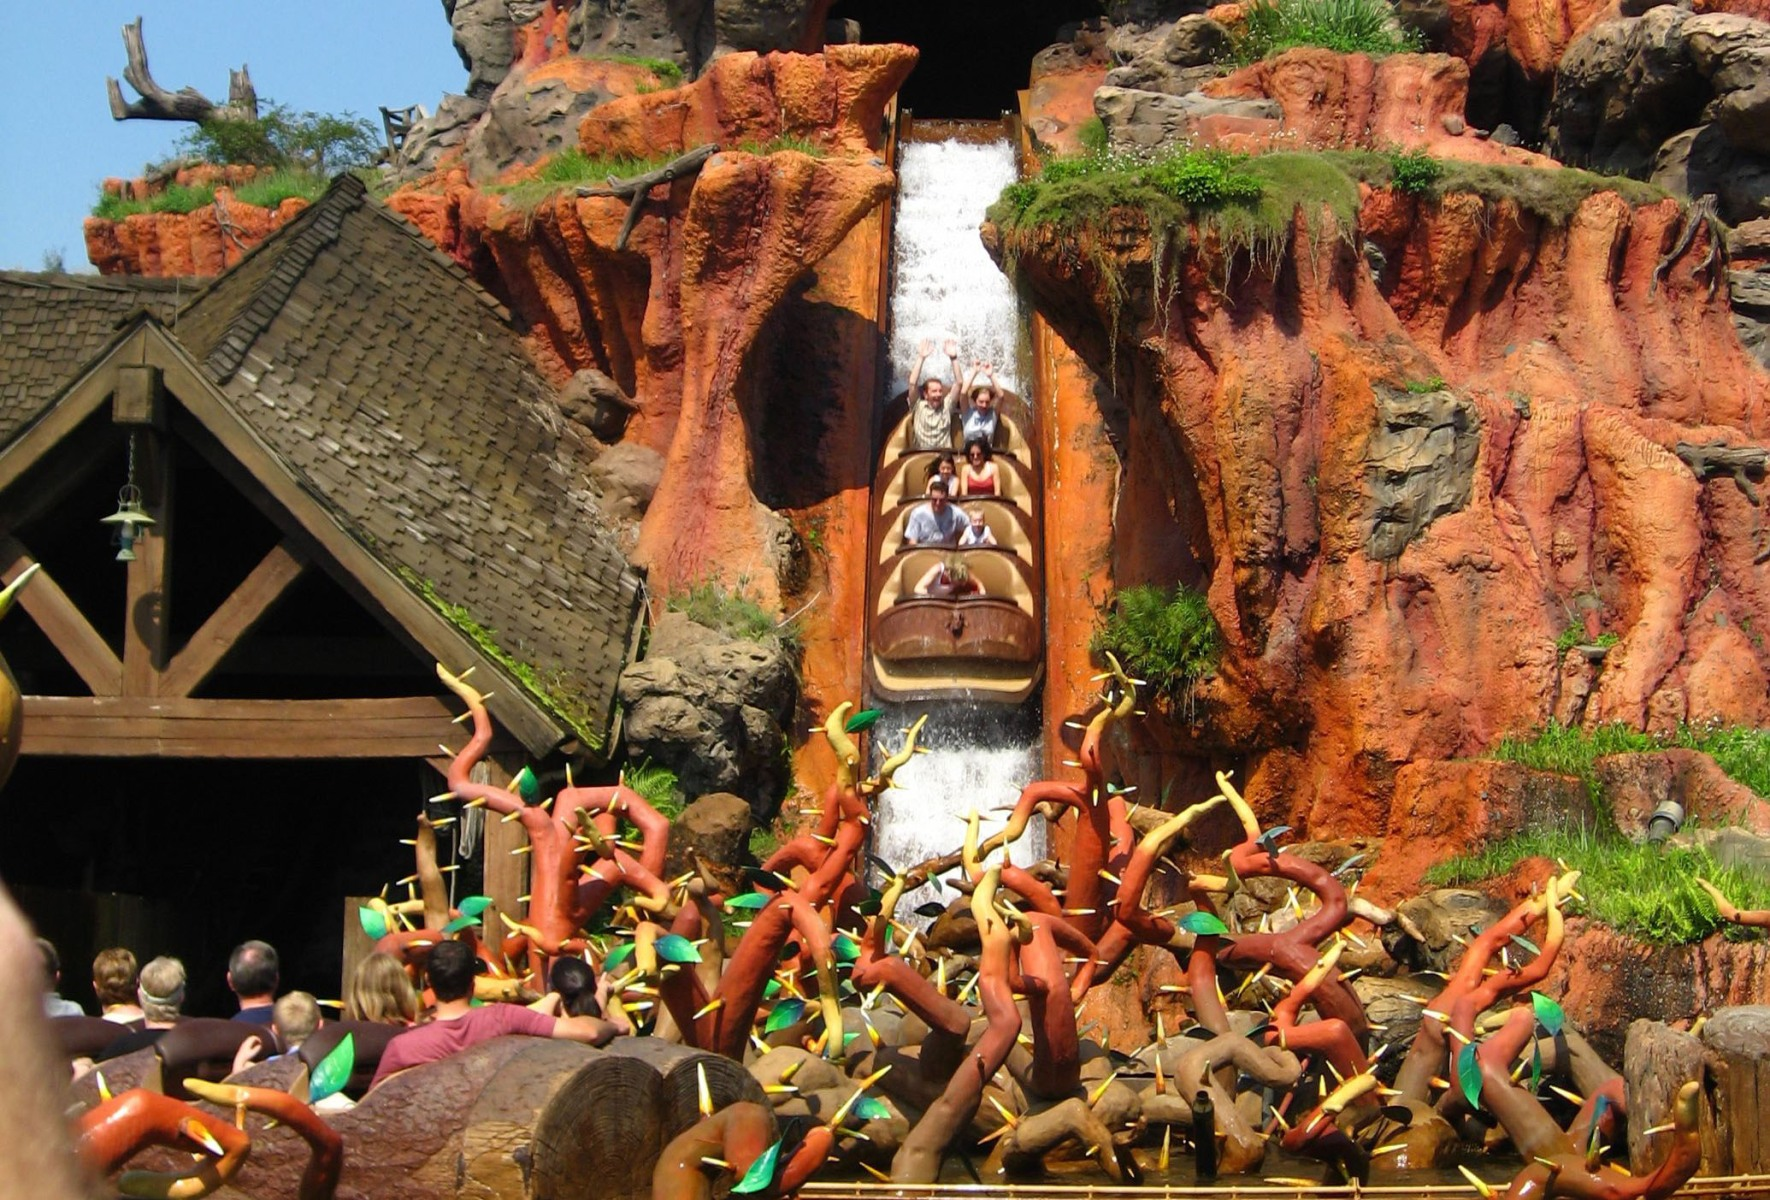 Disney To Make Splash Mountain Ride Less Racist Insidehook